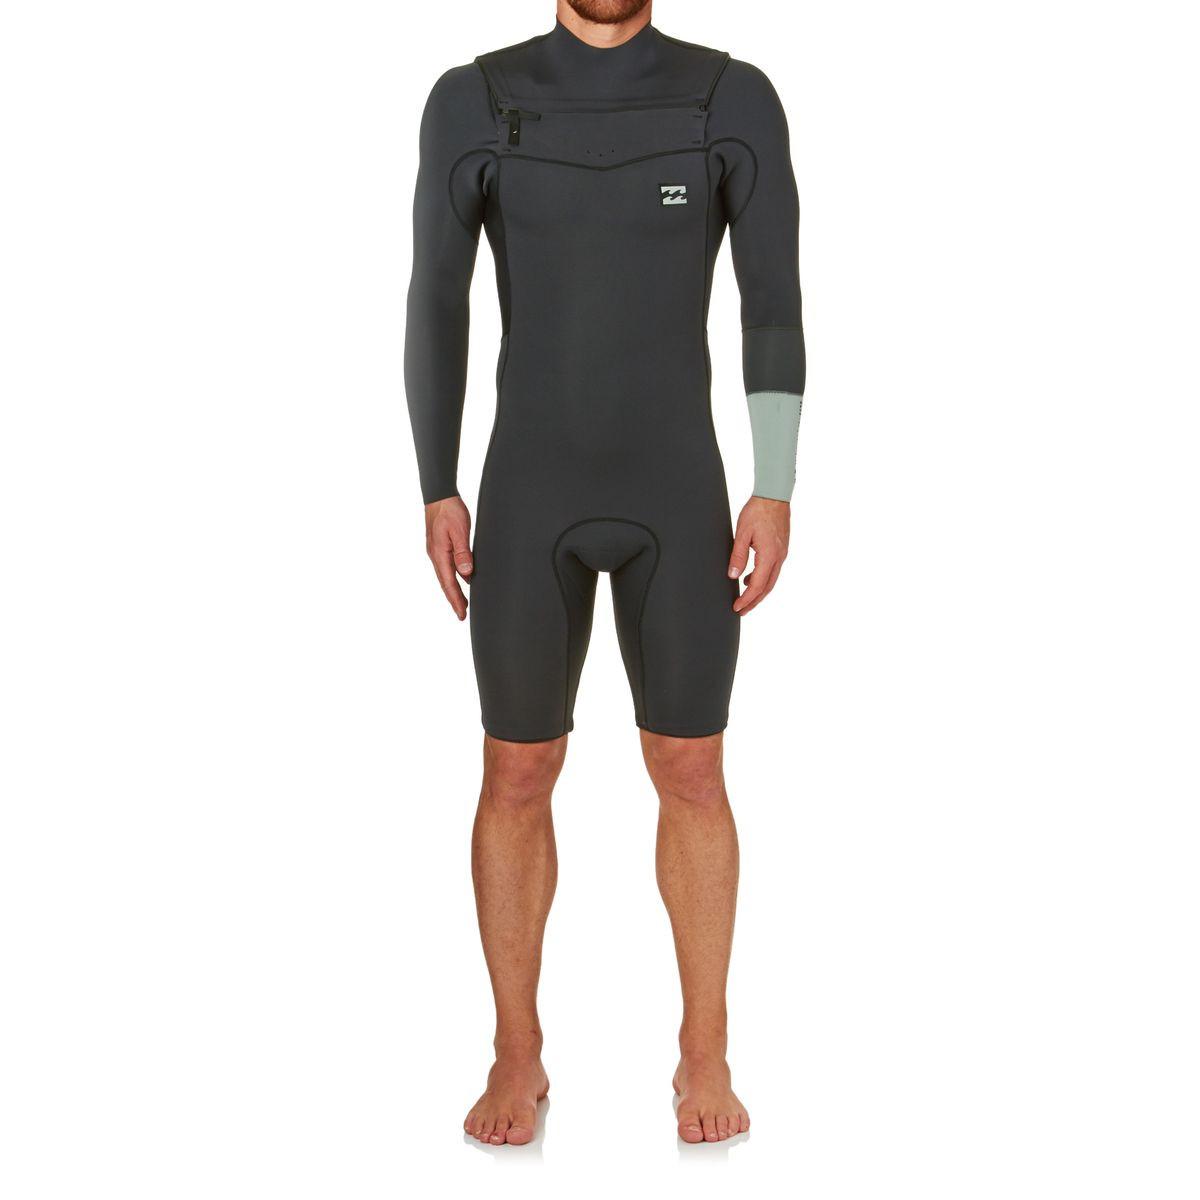 Billabong Revolution Tri Bong 2mm Long Sleeve Shorty Wetsuit - Black Sands